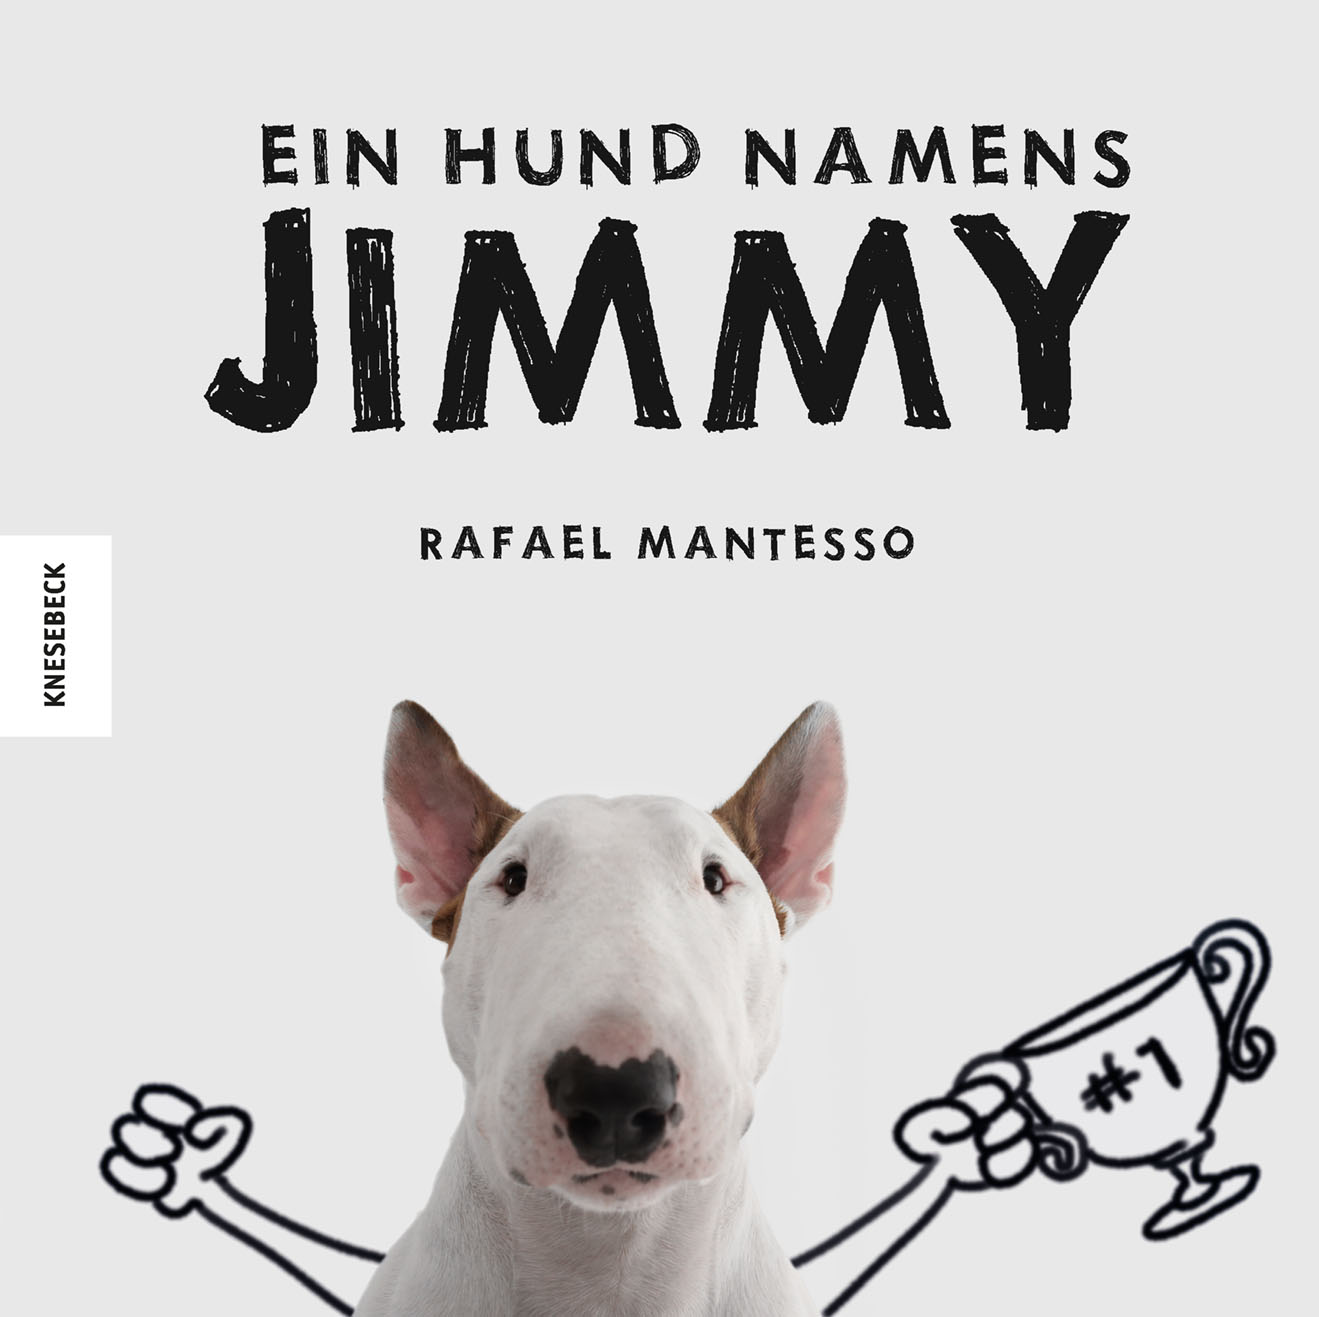 ein hund namens jimmy - buchcover